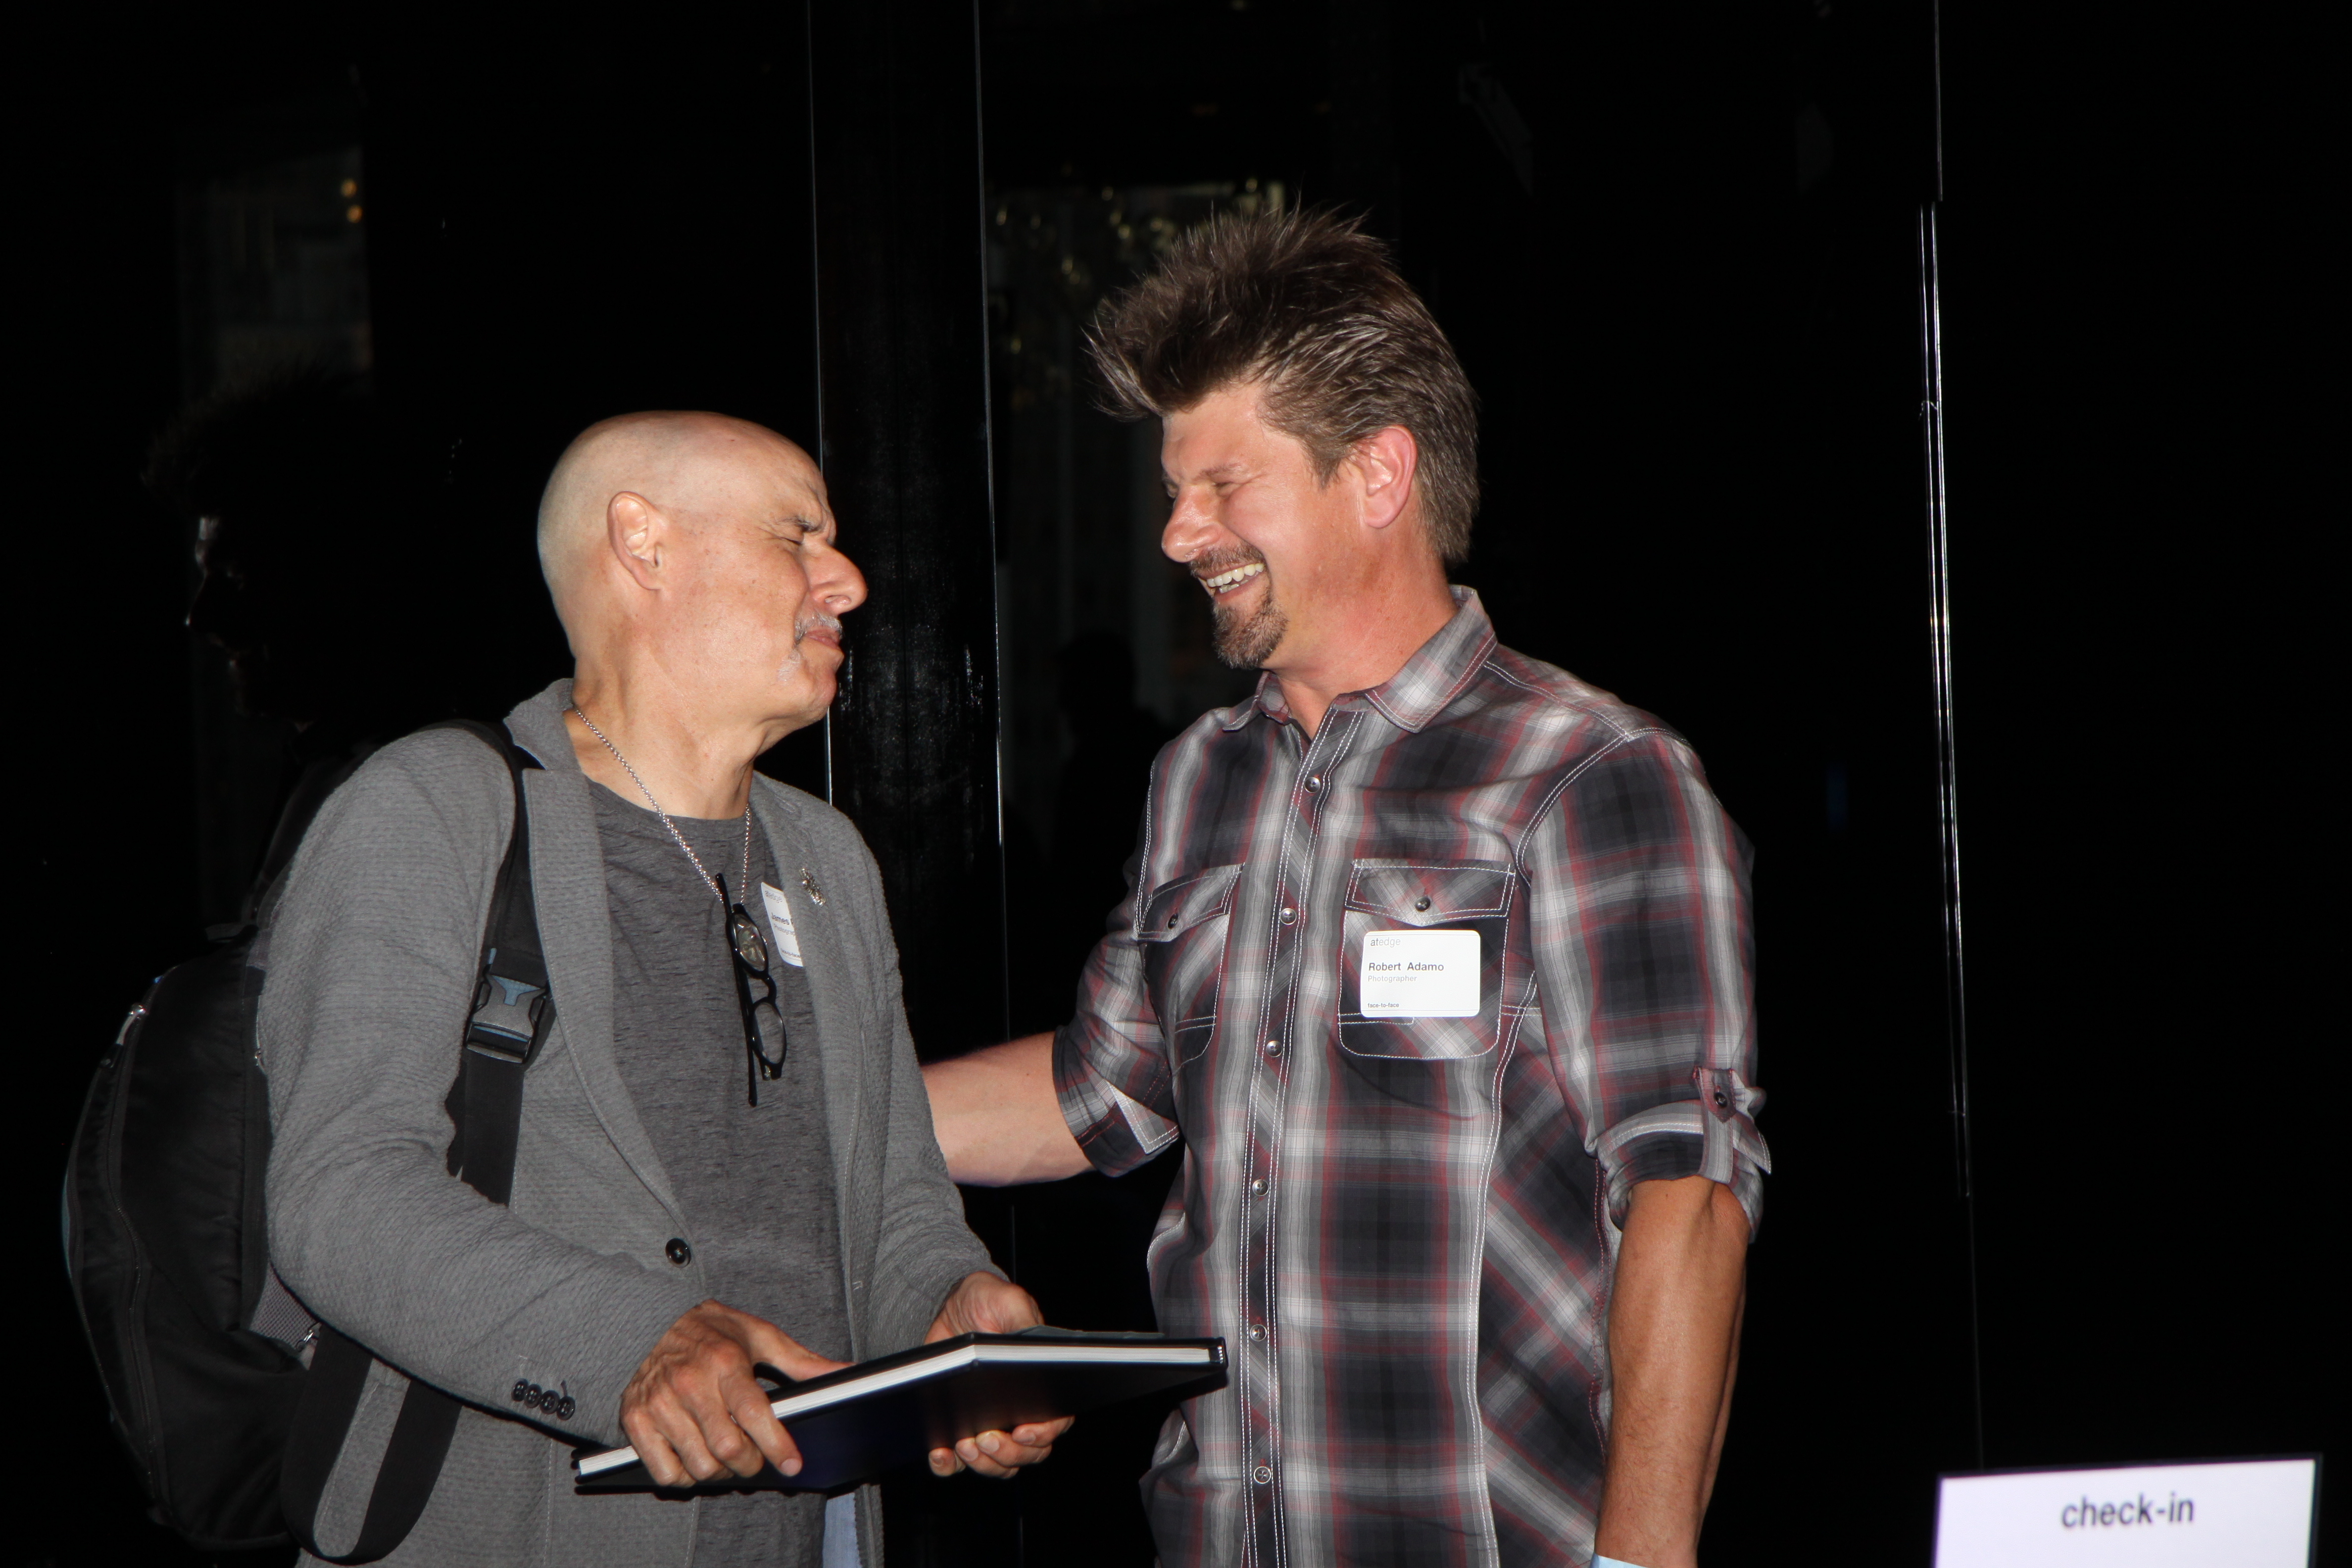 Photographers James Porto (left) and Robert Adumo